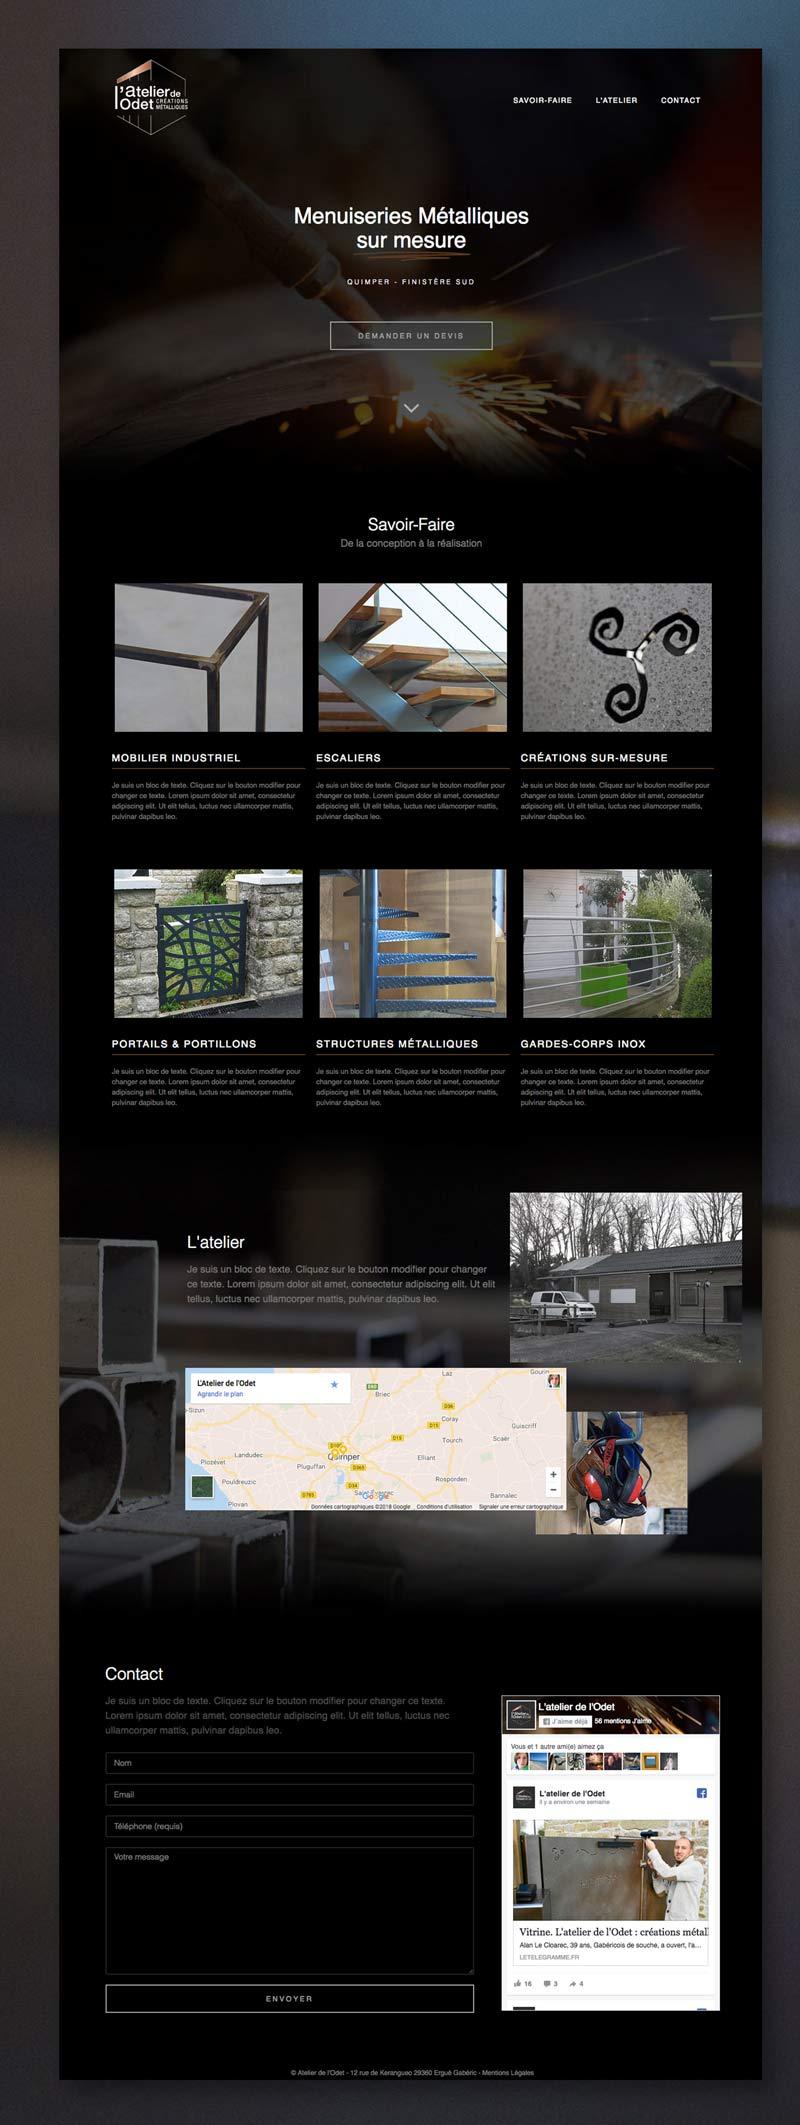 site web atelierdelodet